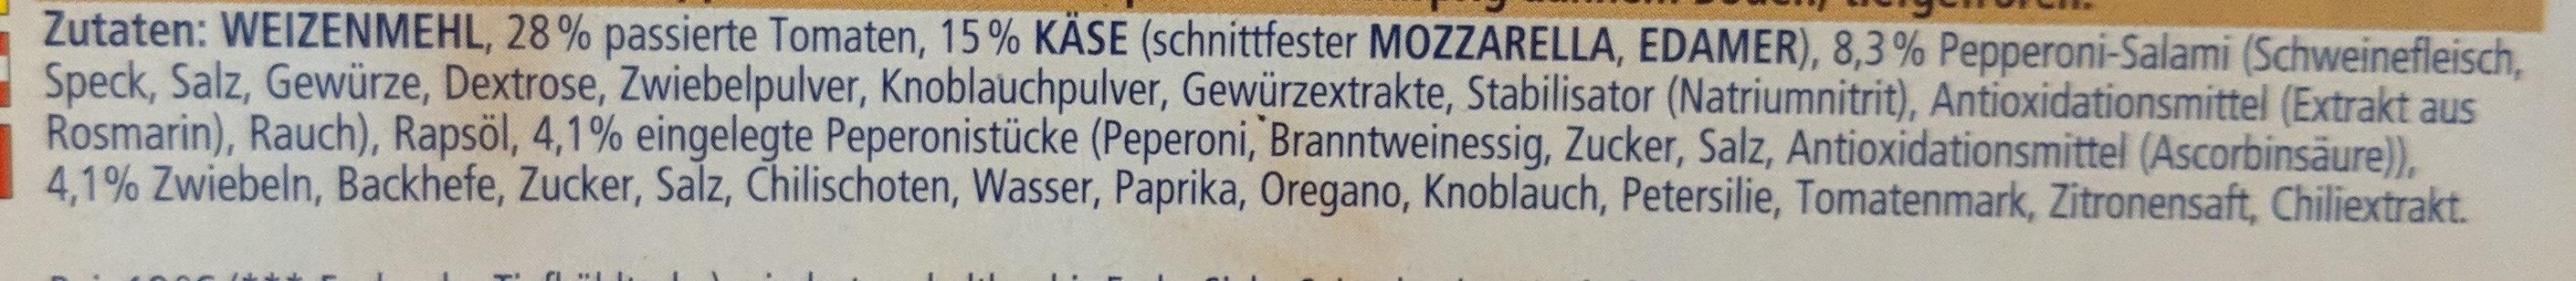 Ristorante pizza diavola - Ingredients - de